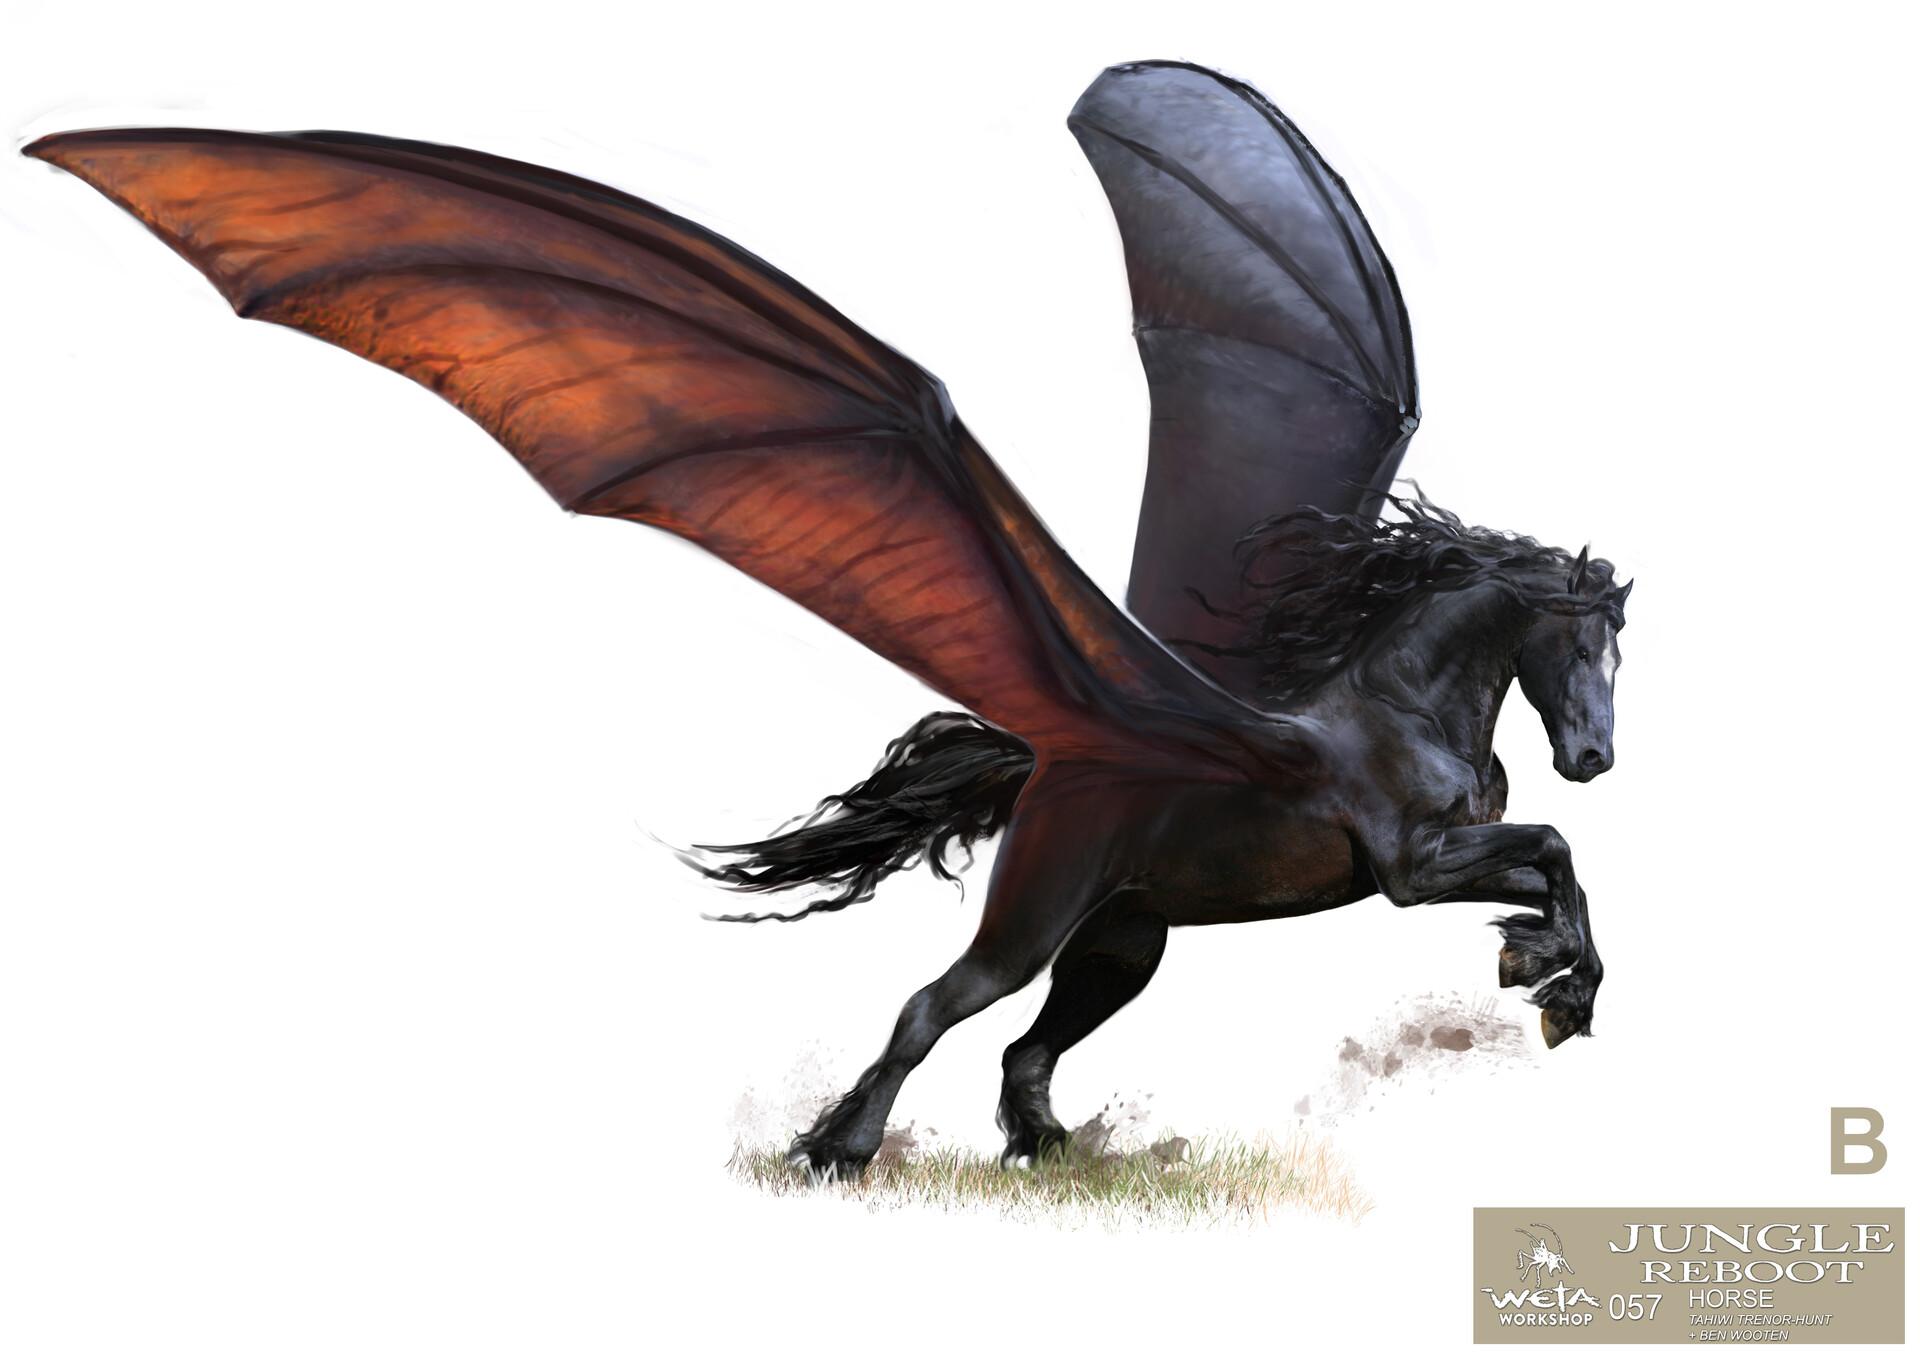 Weta workshop design studio 057 jr horse open wings 03 tth